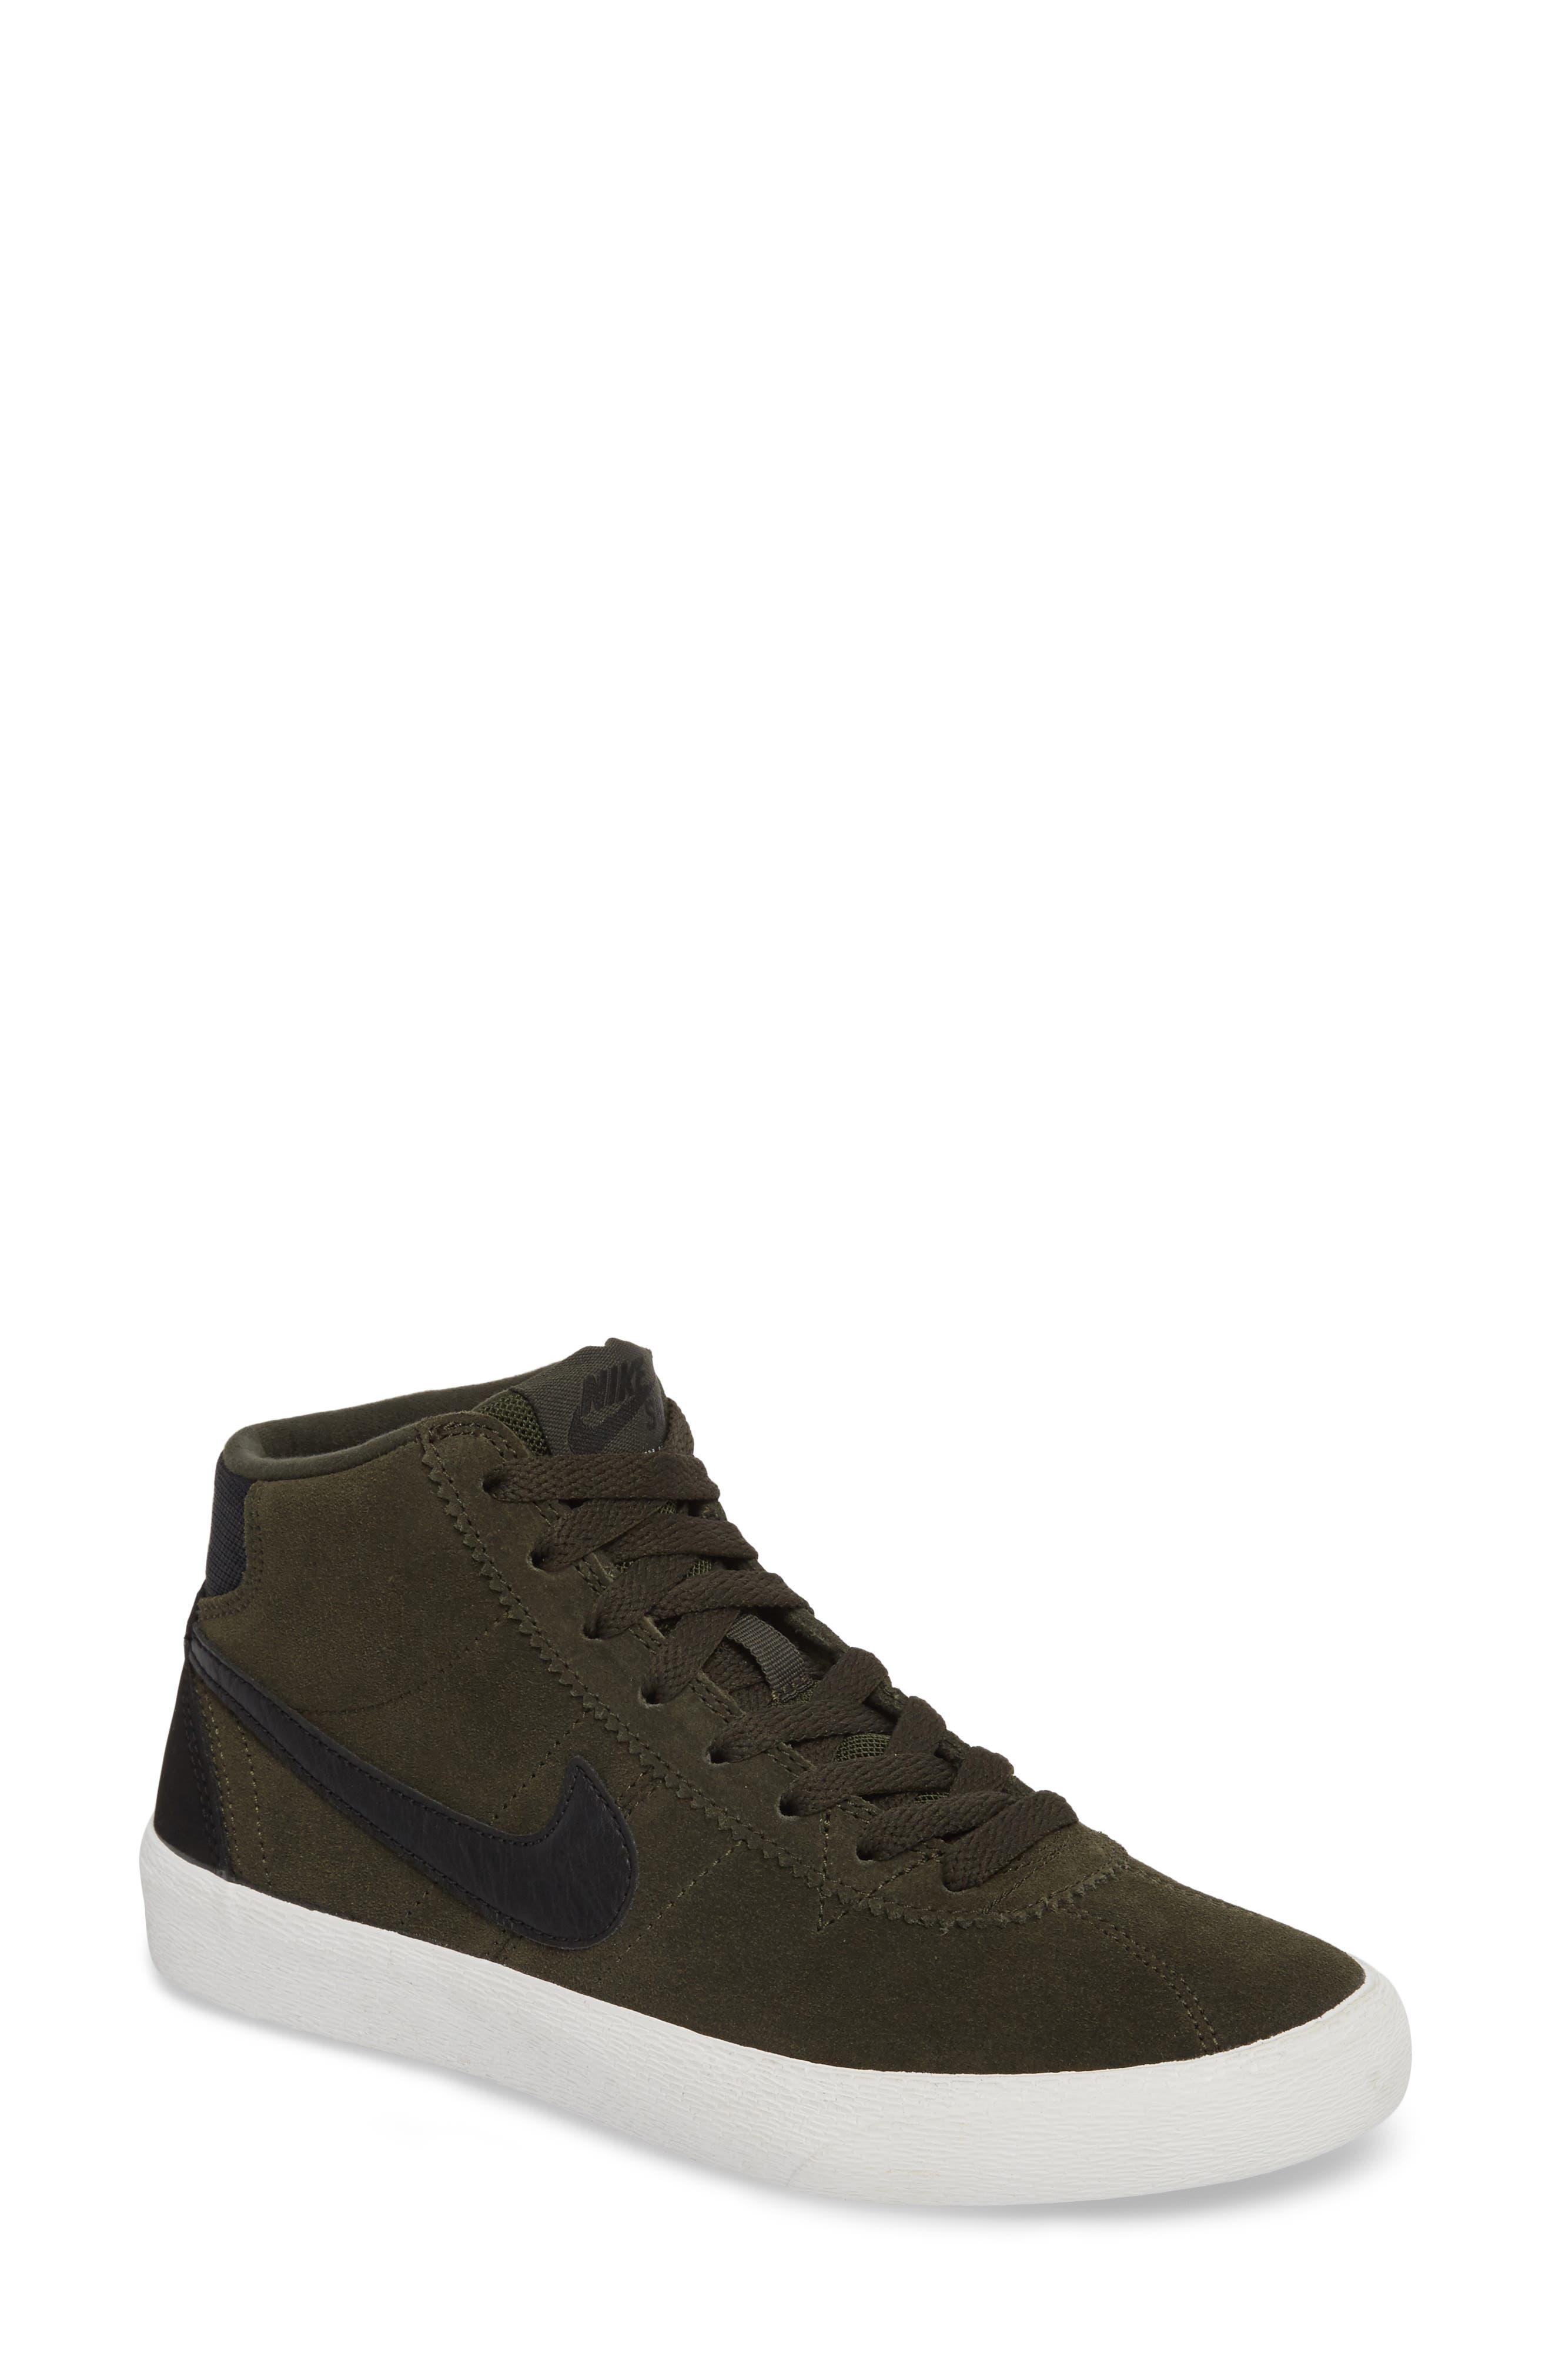 SB Bruin Hi Skateboarding Sneaker,                         Main,                         color, Sequoia/ Black/ Summit White